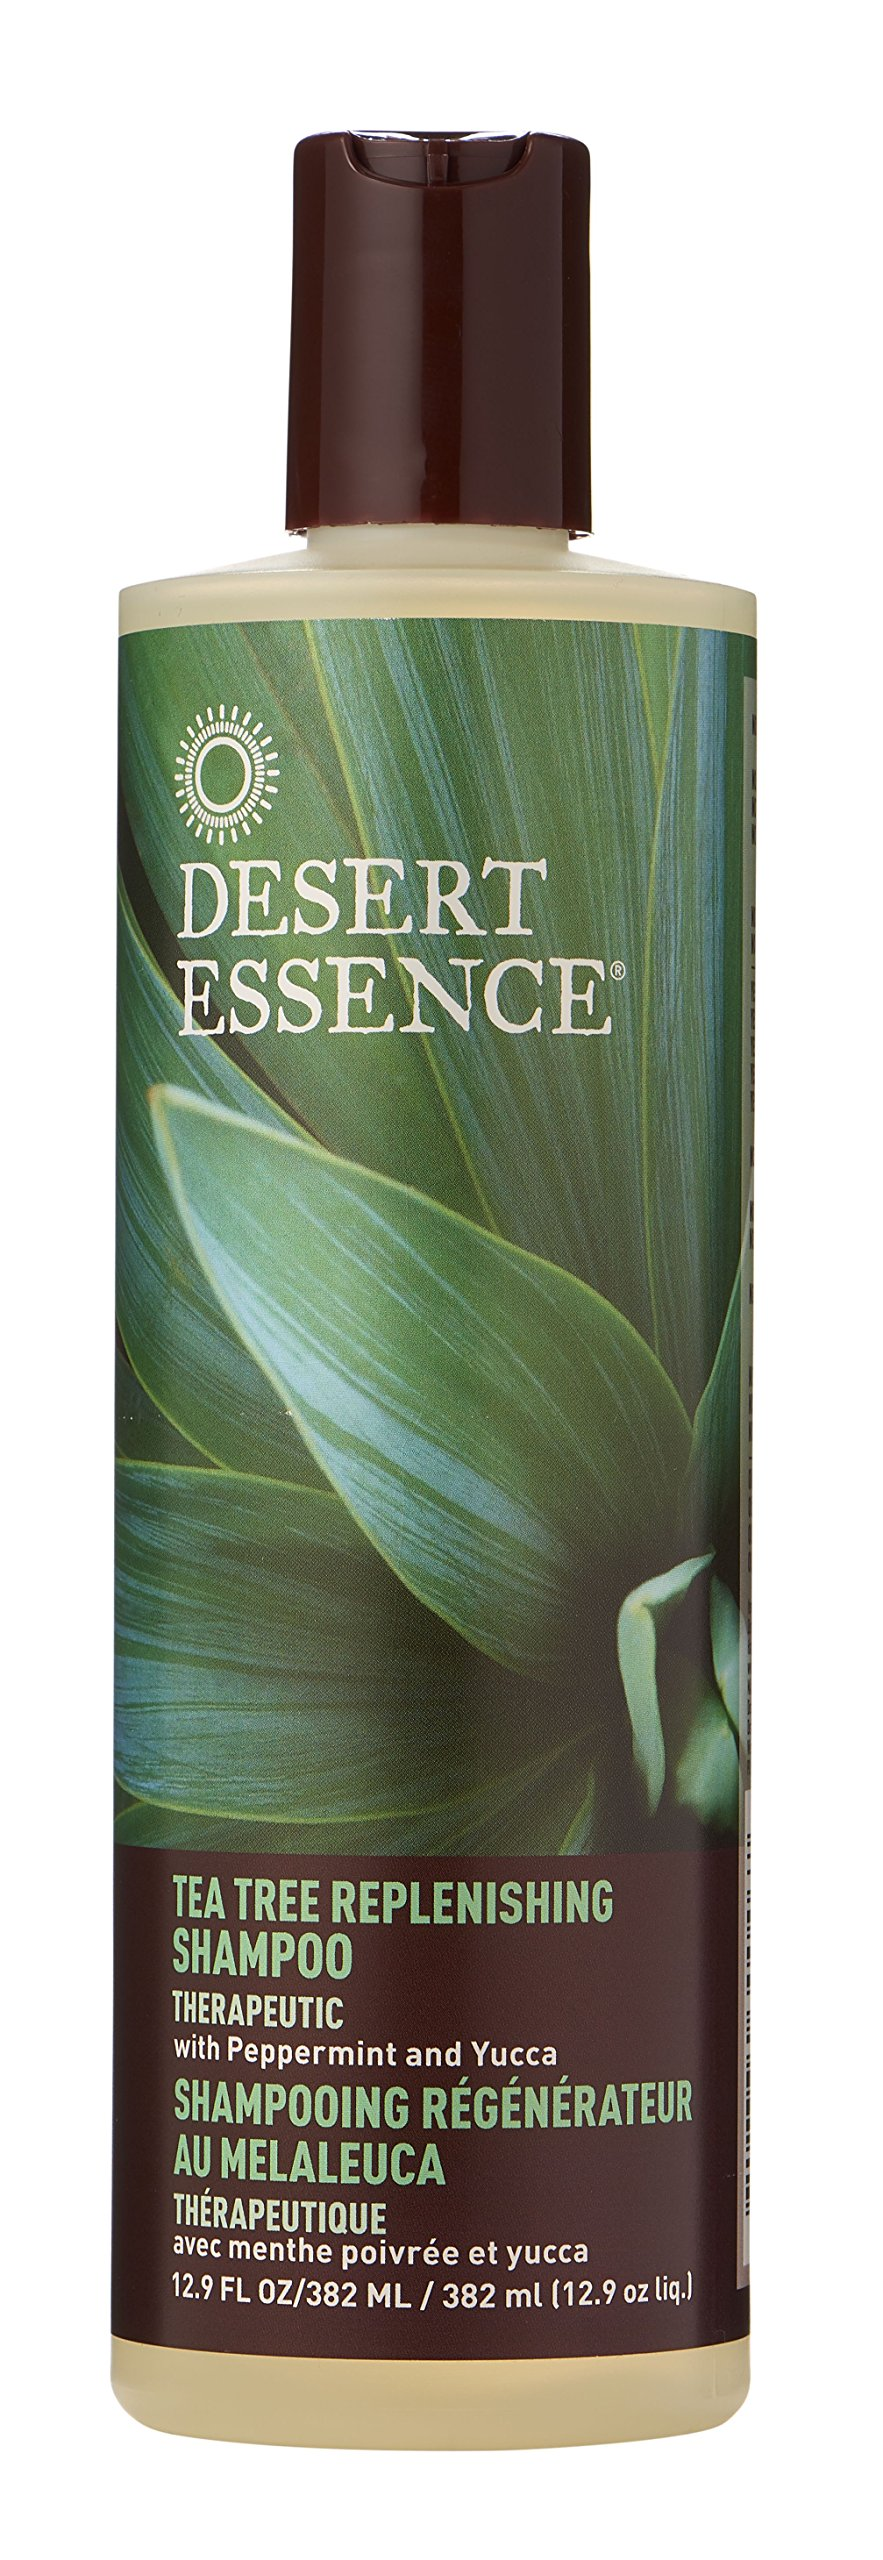 Desert Essence Tea Tree Shampoo - 12.9 fl oz